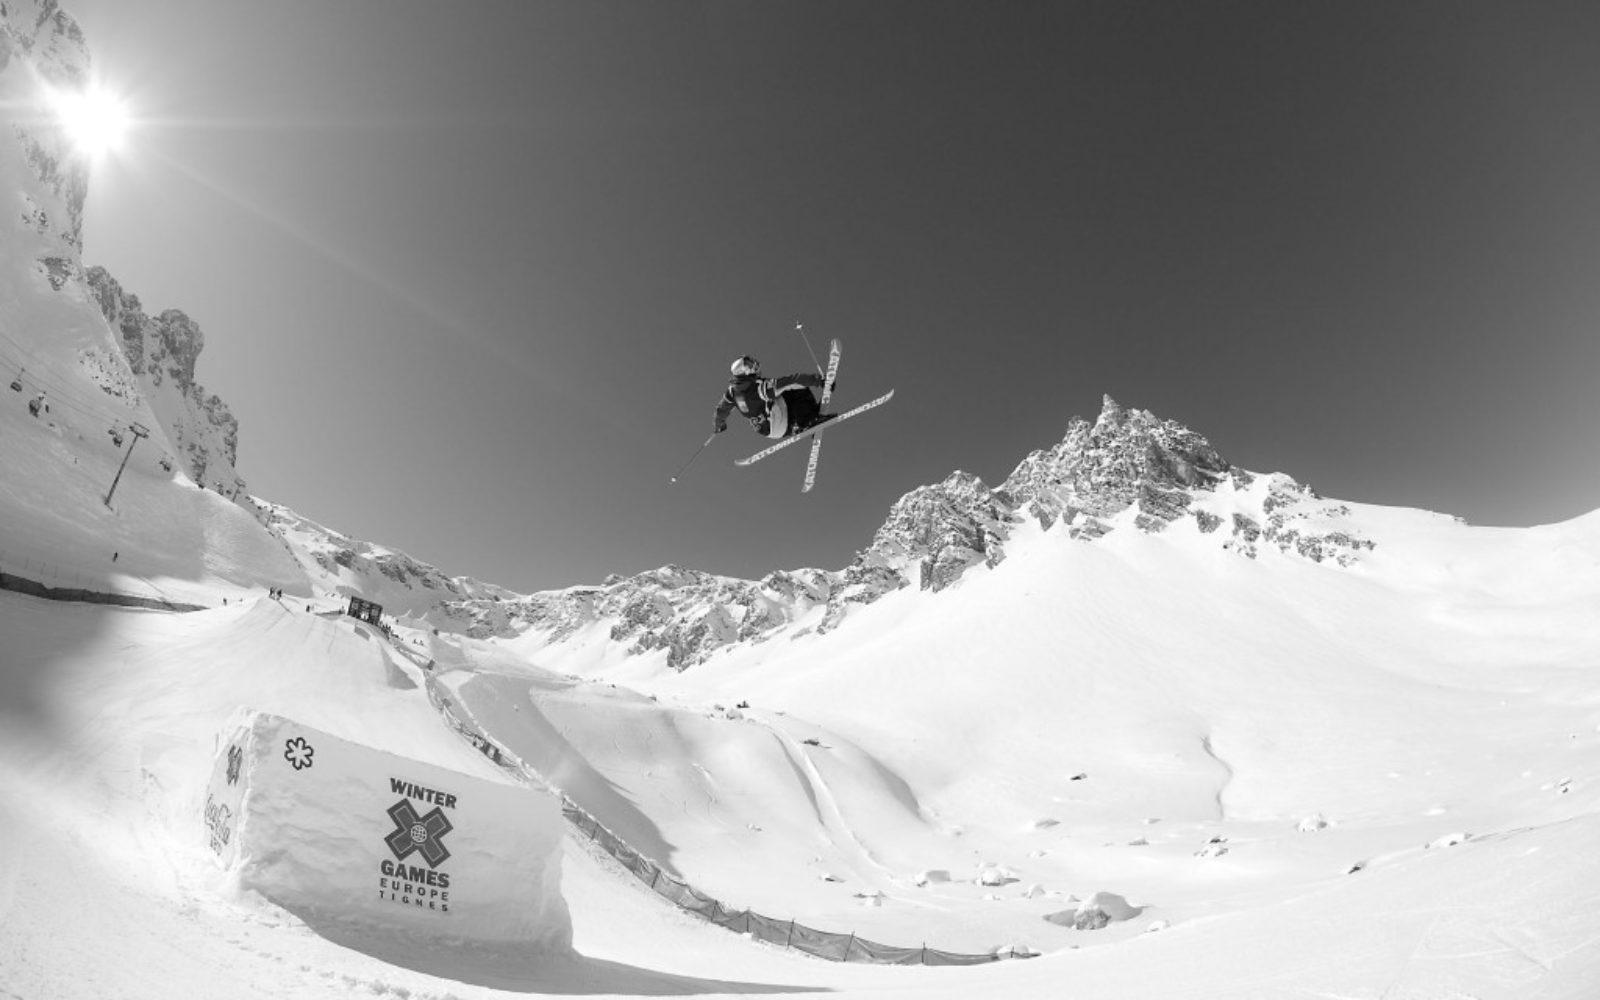 sports-xgames-skier-blackwhite3-1024x640